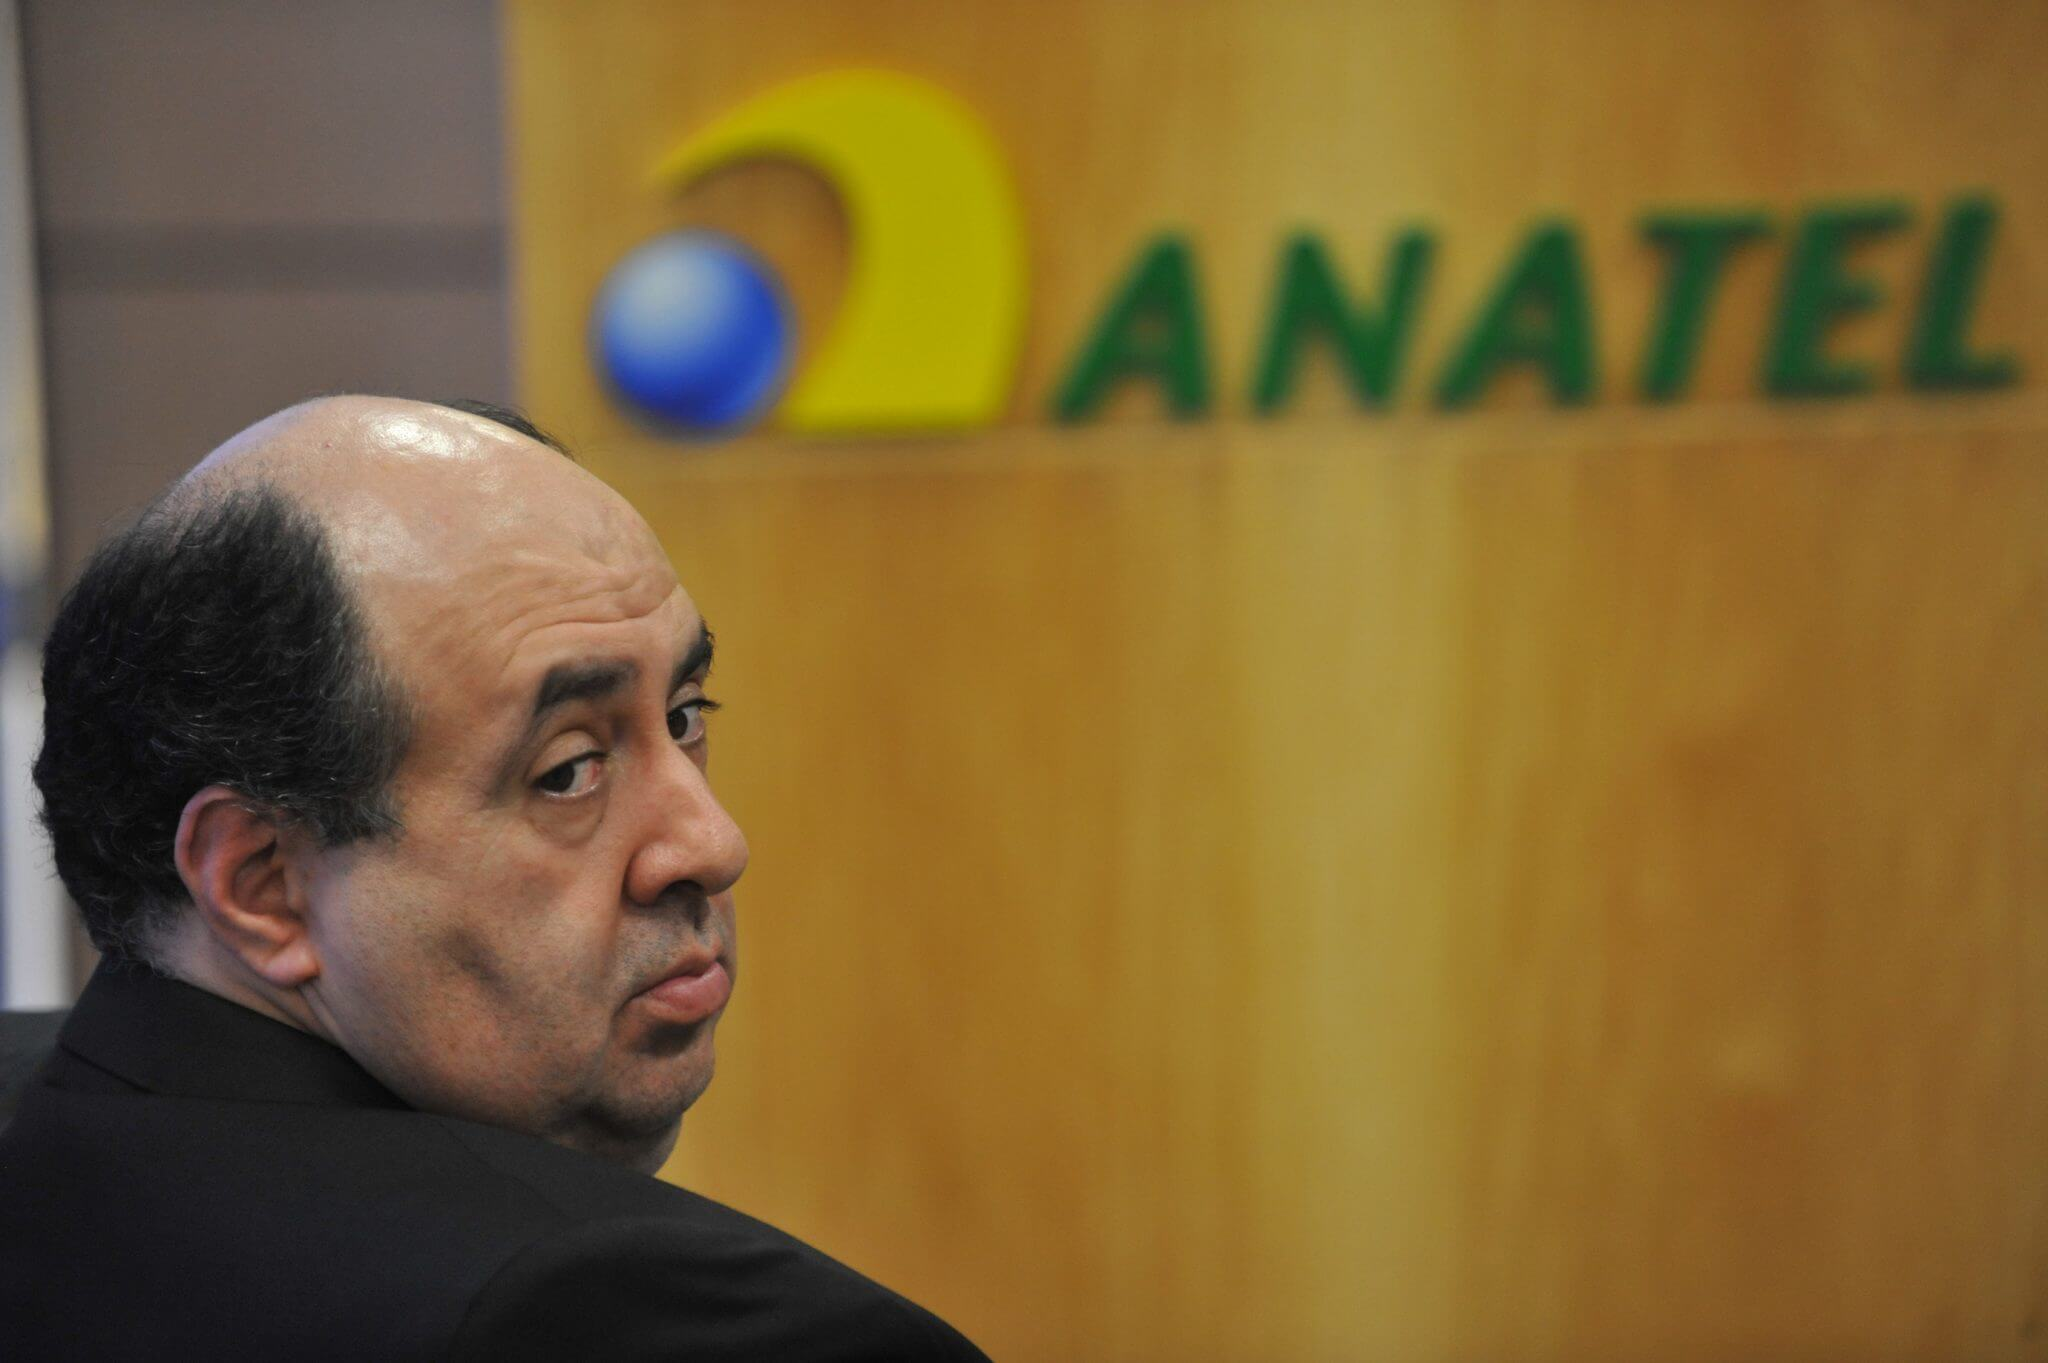 Tchau, querido: Presidente da Anatel renuncia ao cargo 7